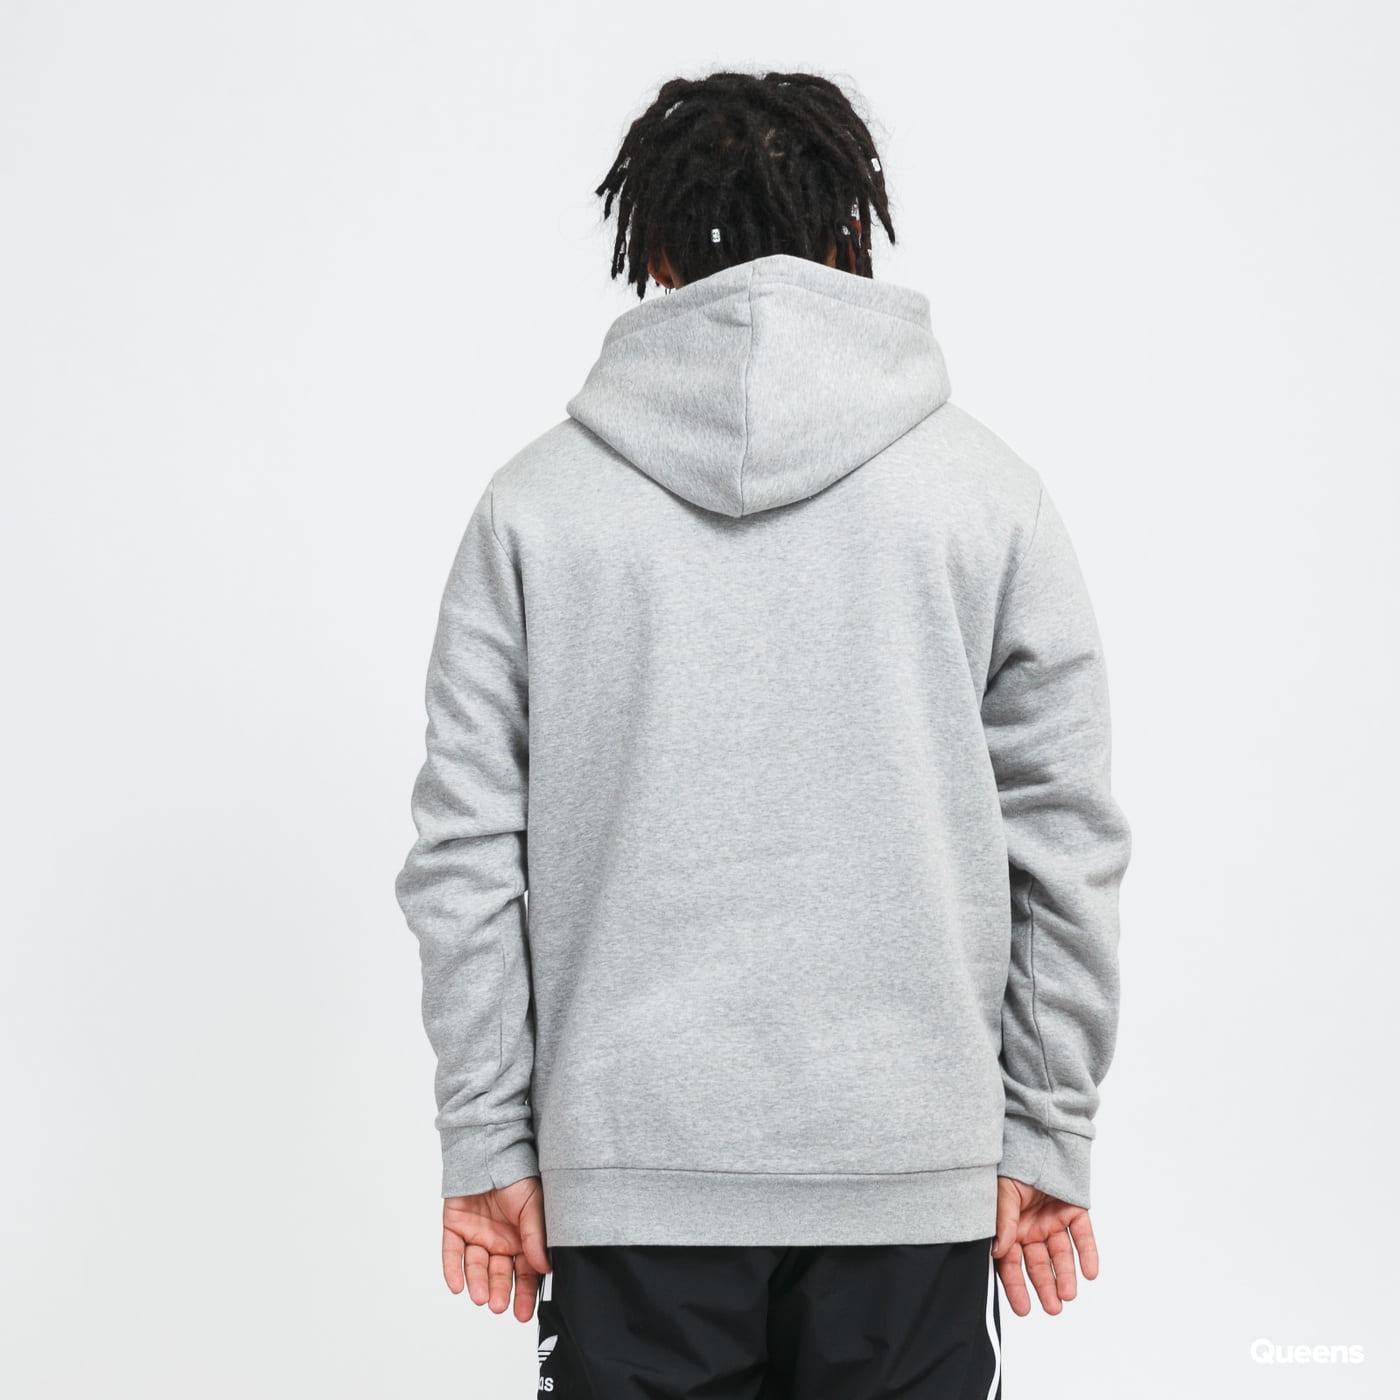 adidas Originals 3Stripes Hoody melange gray